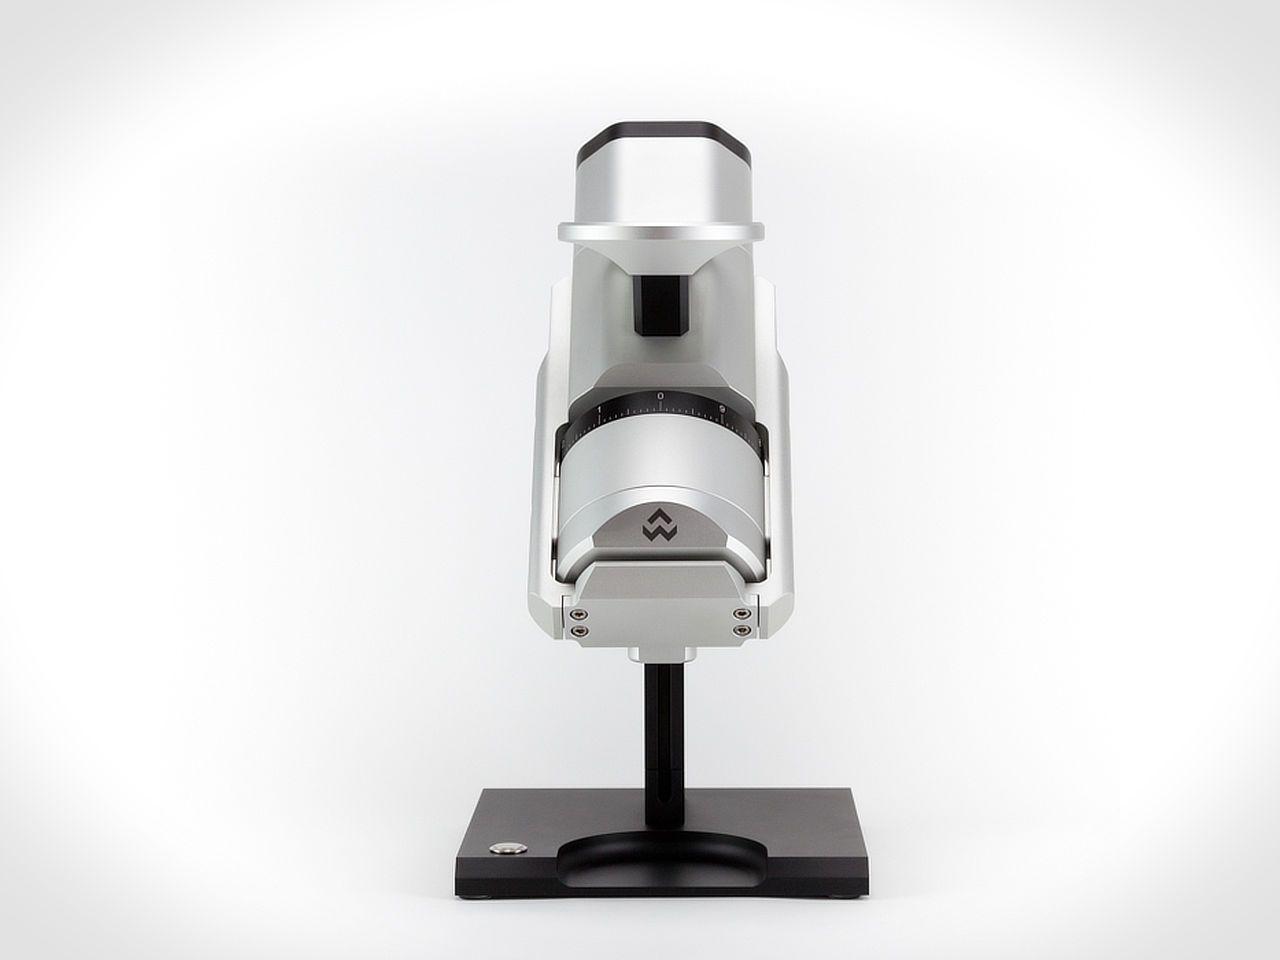 lyn-weber-eg1-coffee-grinder-002